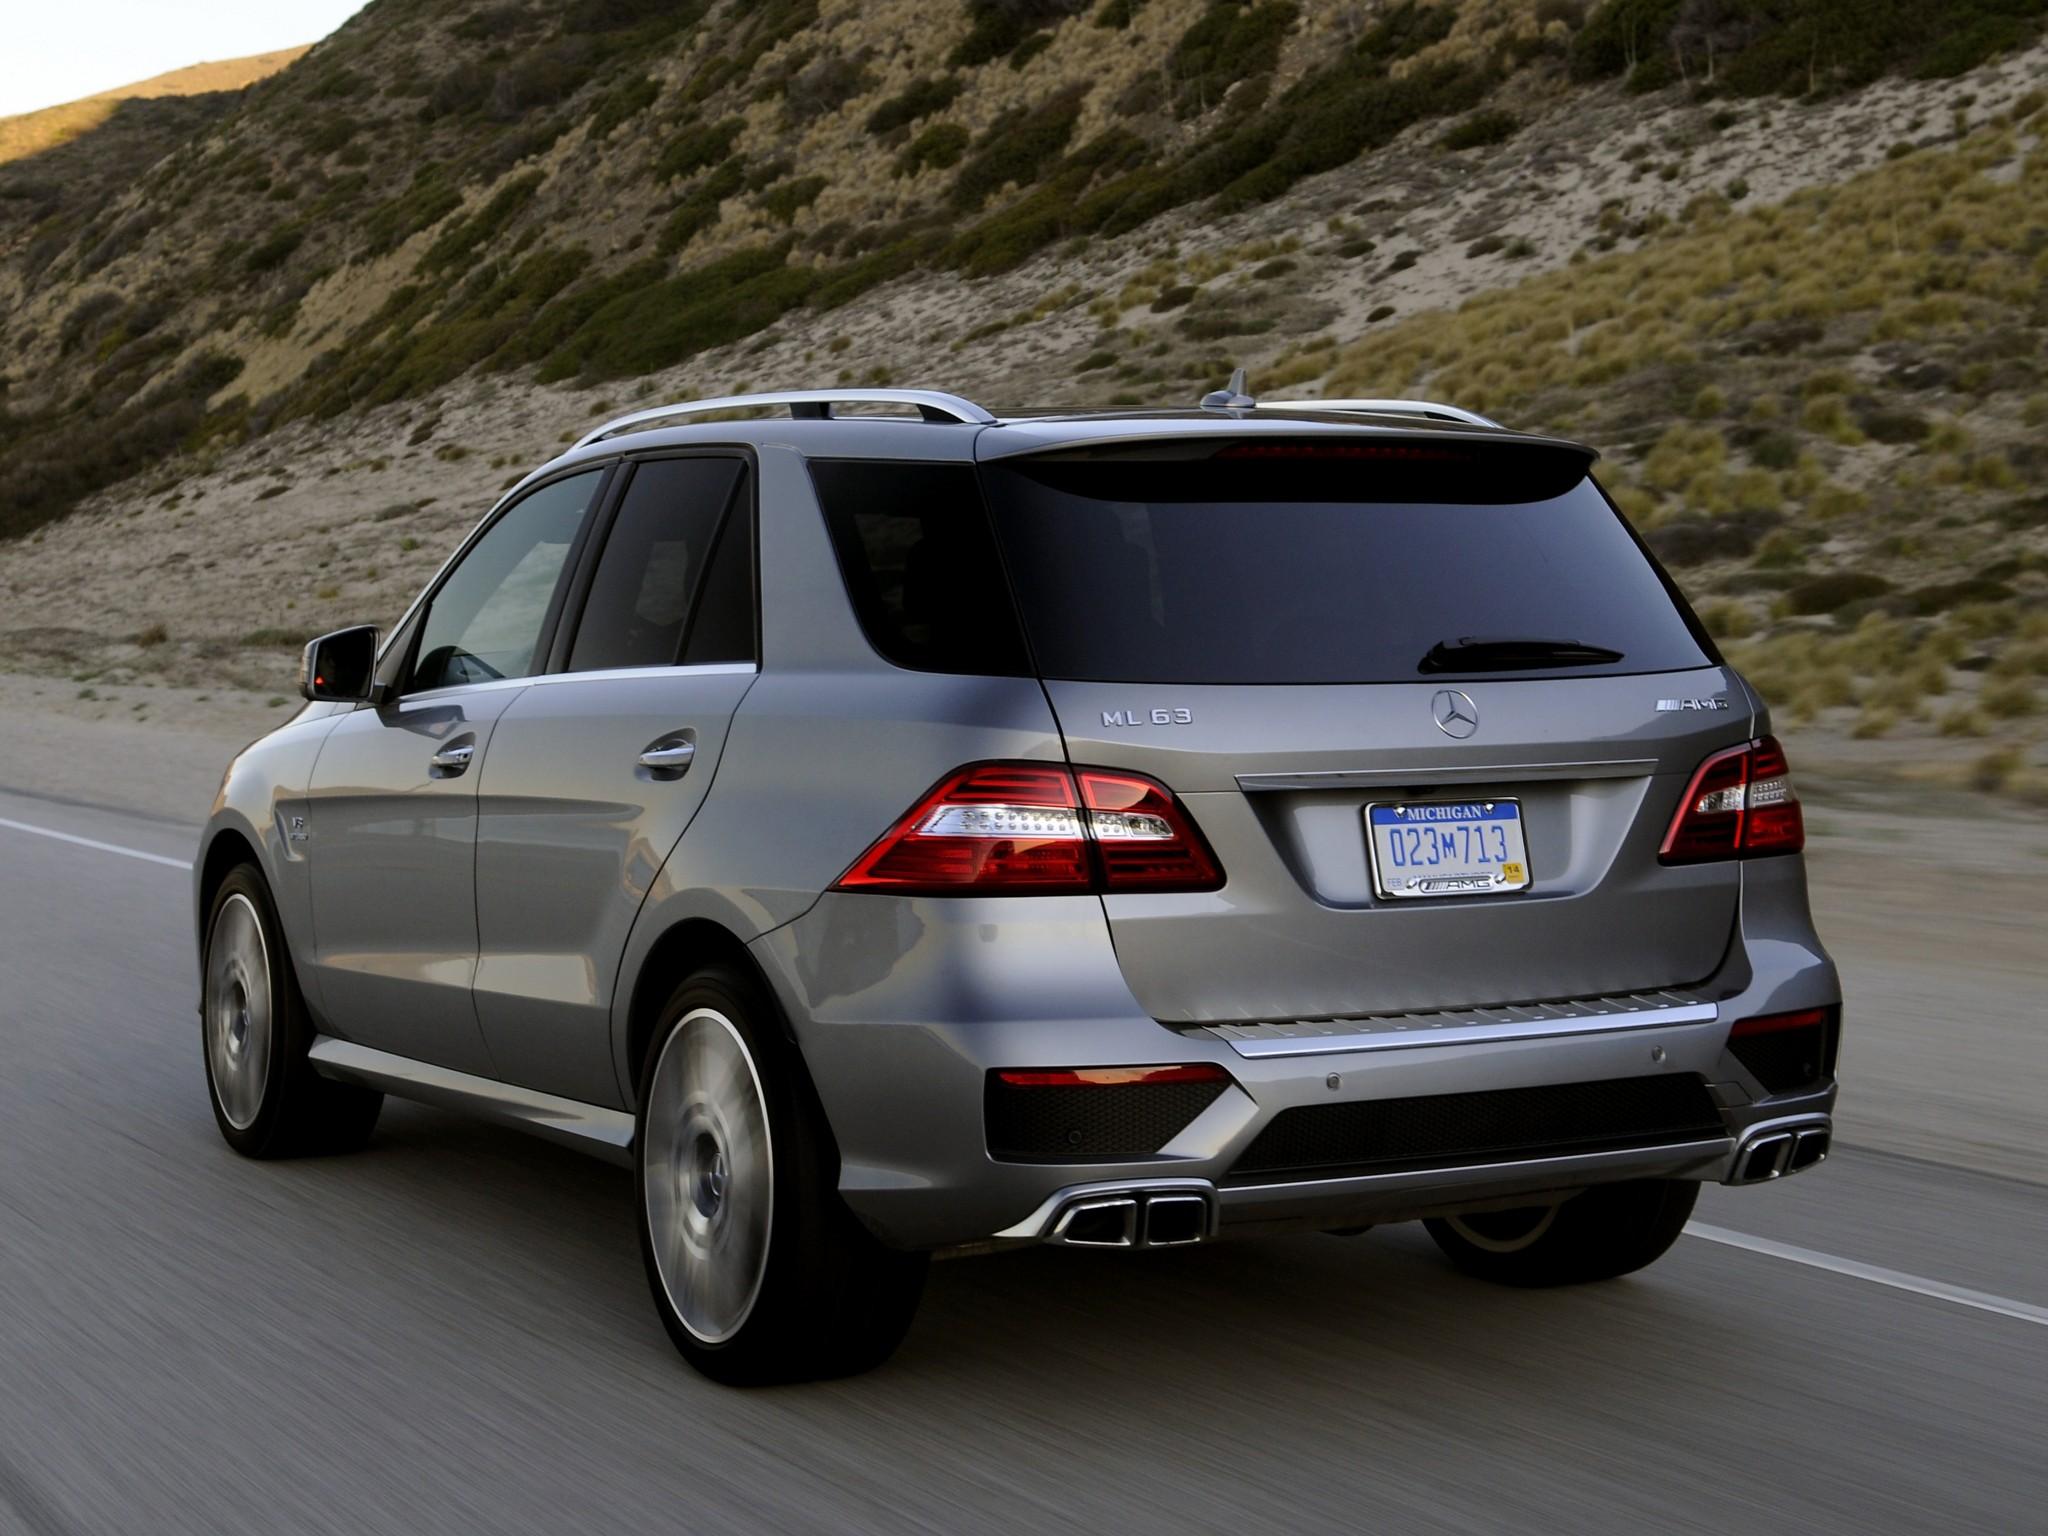 Mercedes benz ml 63 amg w166 specs 2011 2012 2013 2014 2015 autoevolution